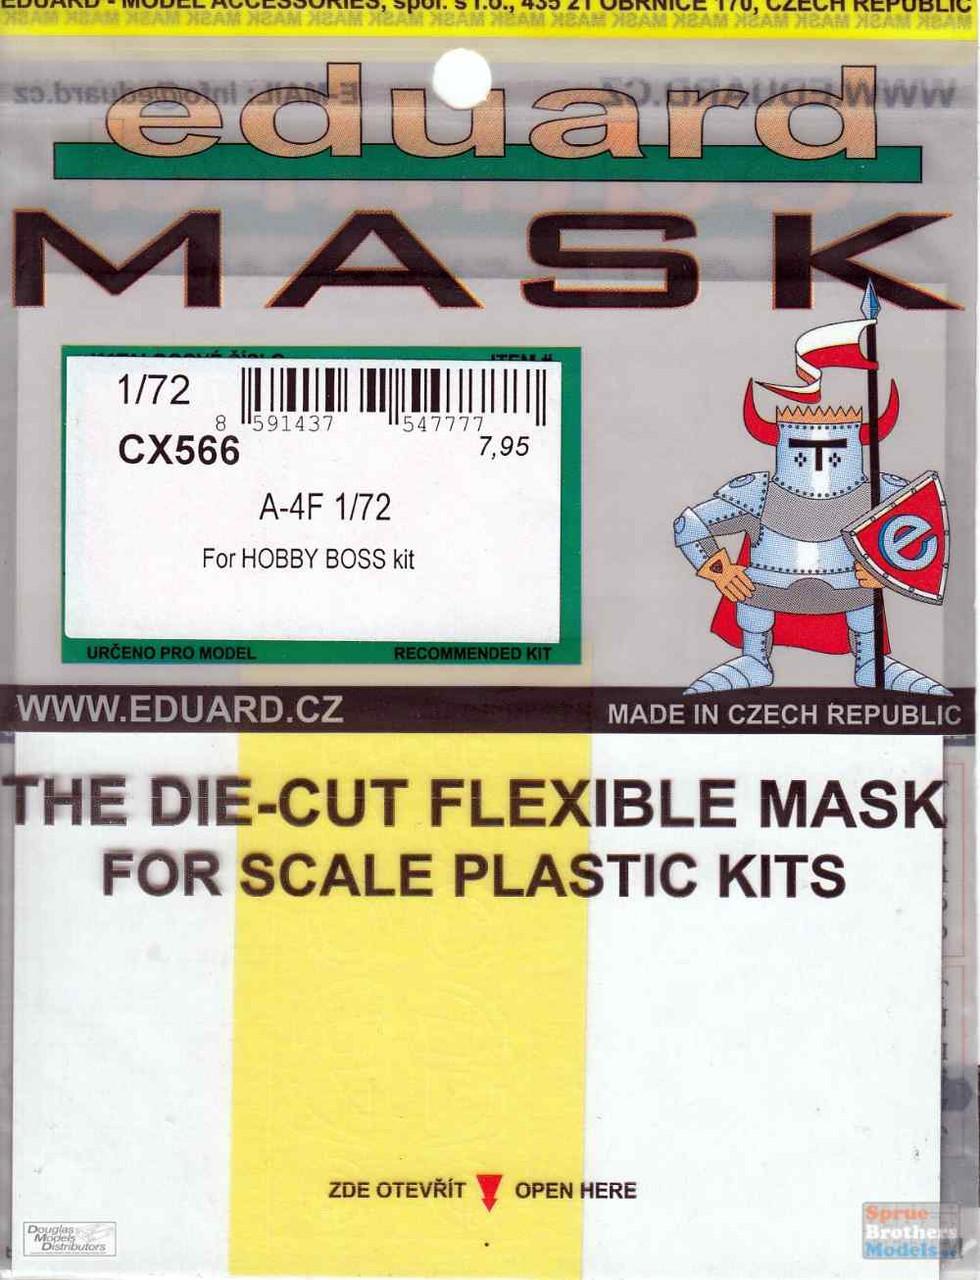 EDUCX566 1:72 Eduard Mask - A-4F Skyhawk (HBS kit)